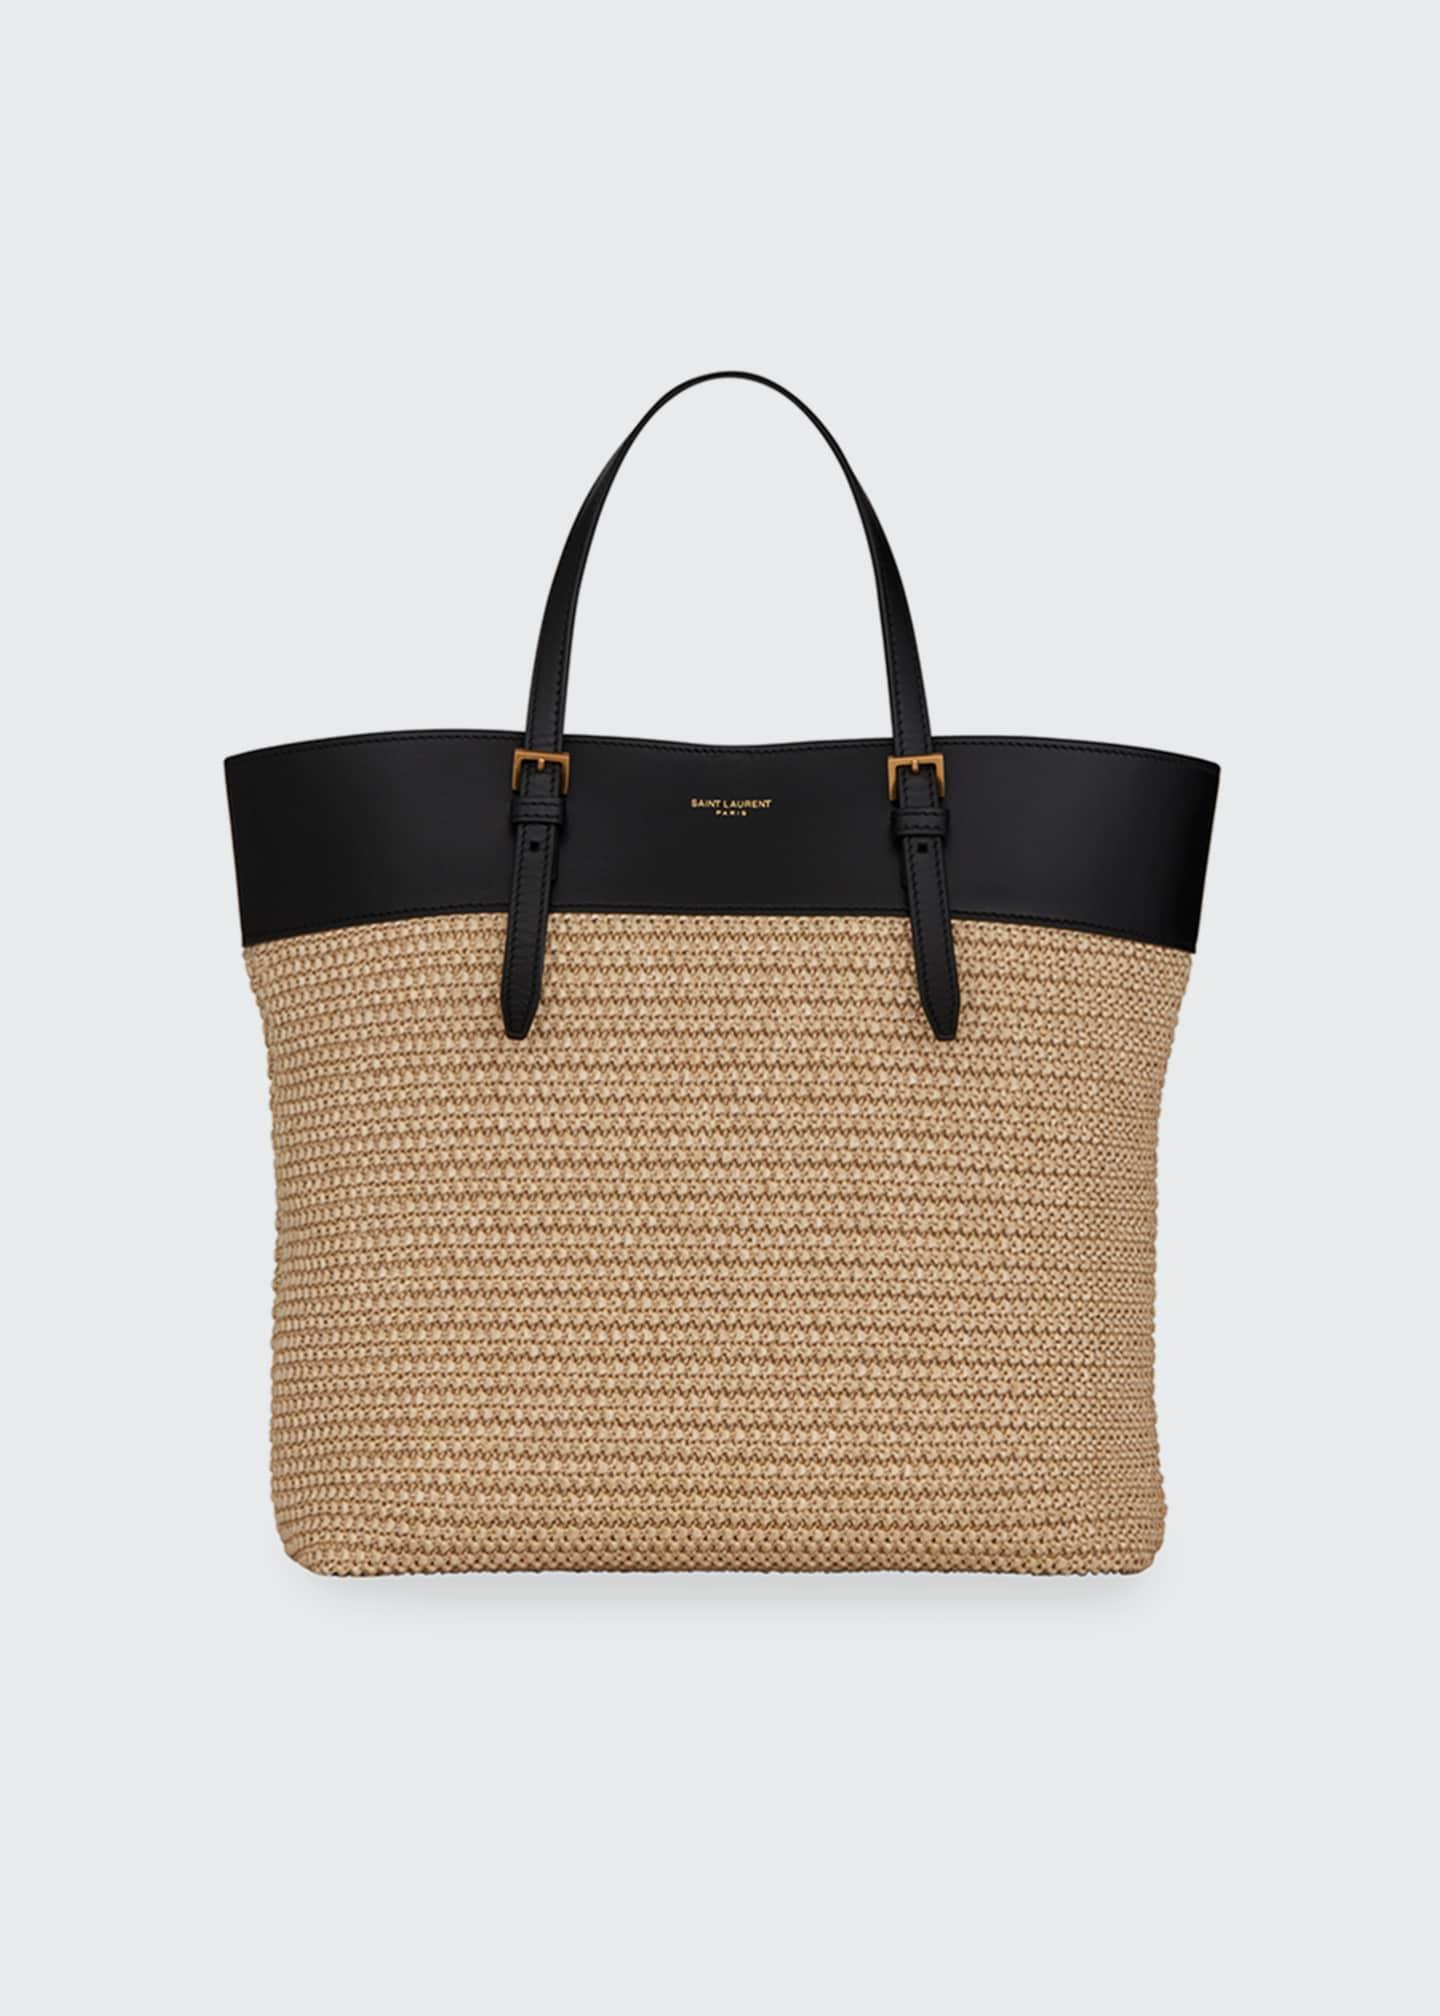 Saint Laurent YSL Raffia Small Shopper Tote Bag